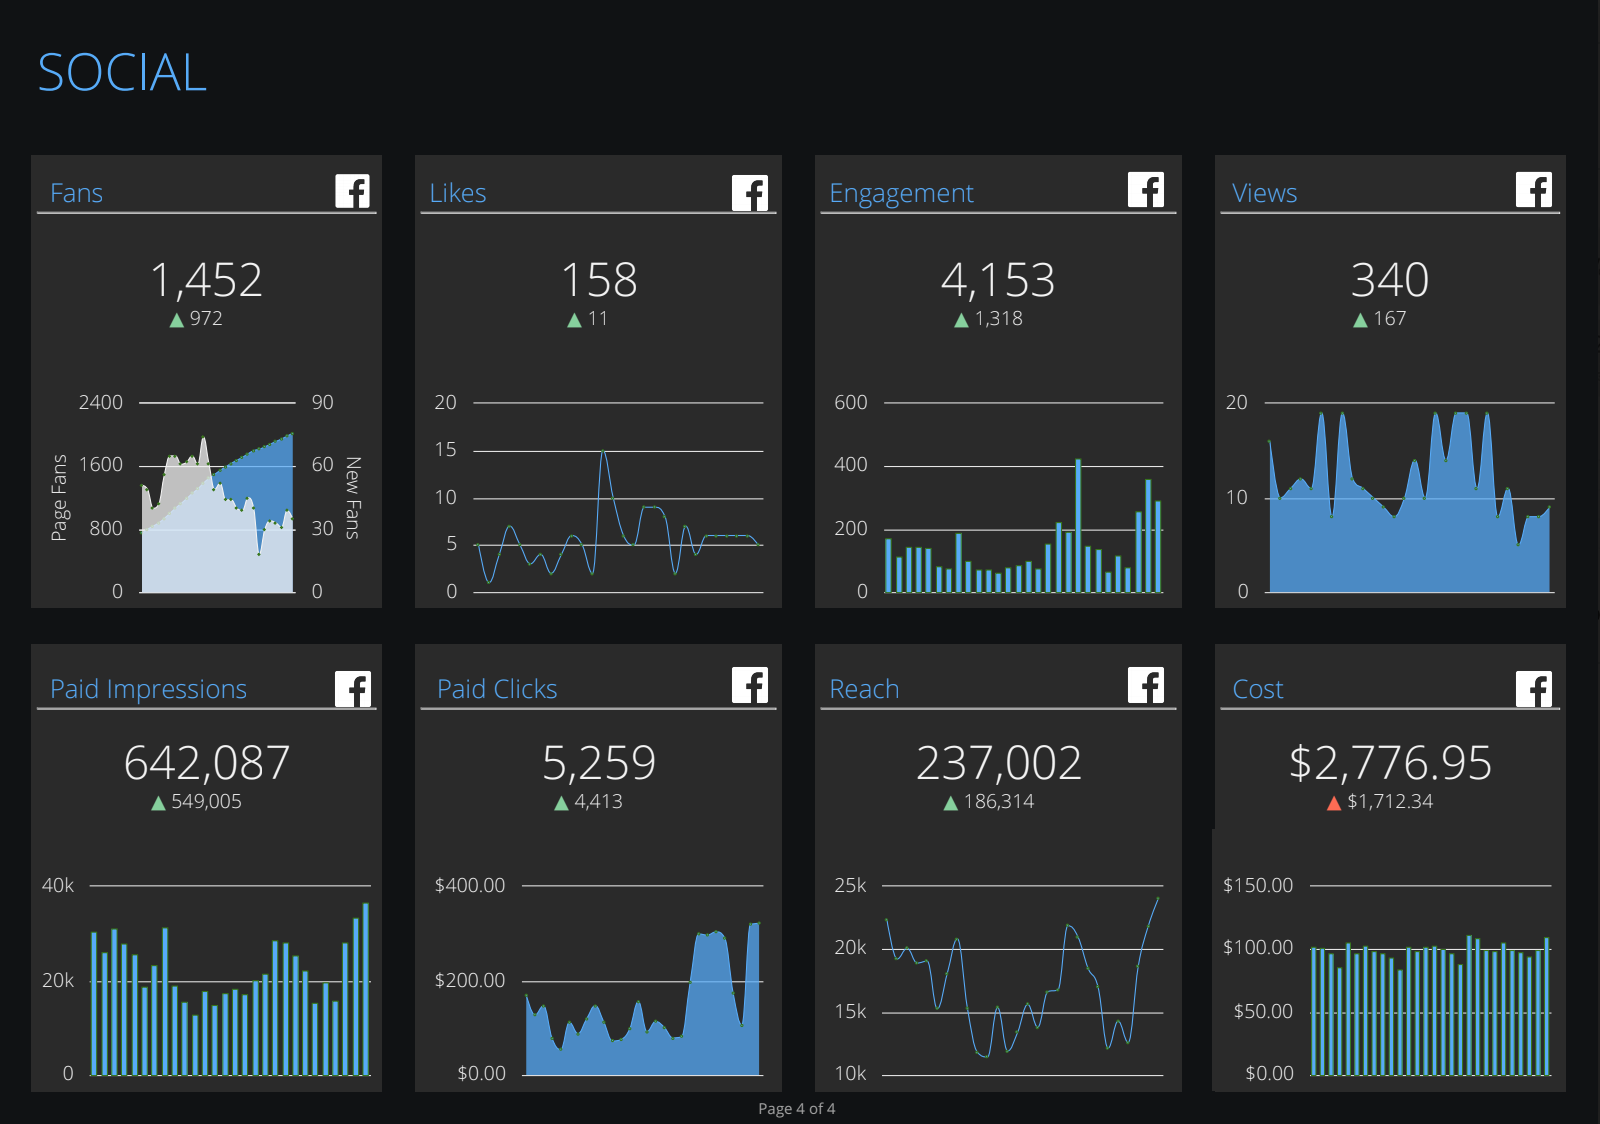 NinjaCat Software - Social media marketing dashboard example from NinjaCat